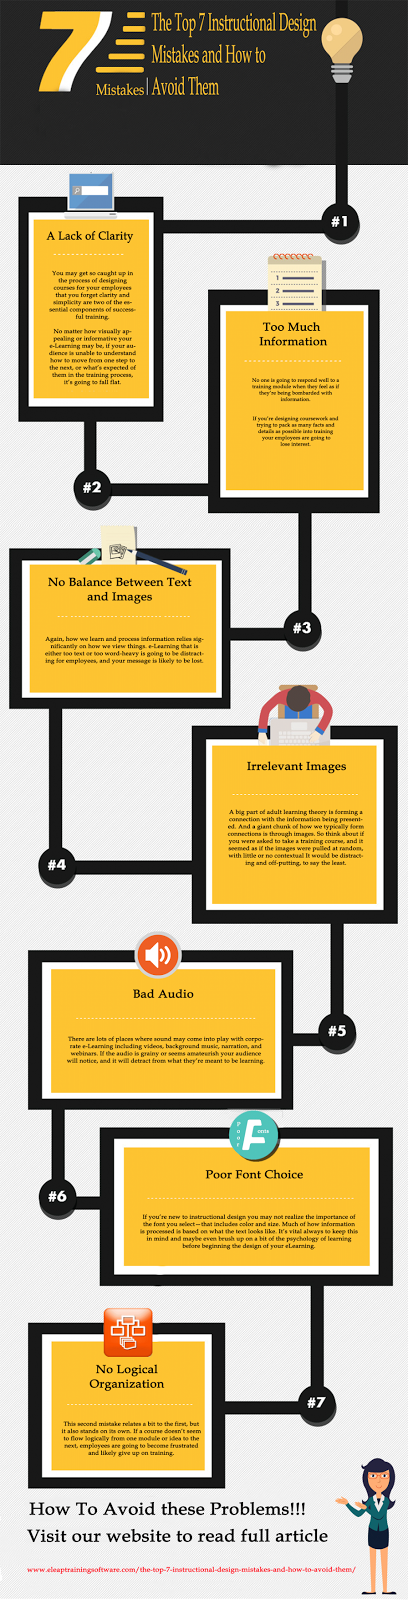 7 Design Mistakes To Avoid In Your Hall: Дистанционное обучение (МВД и не только): апреля 2016